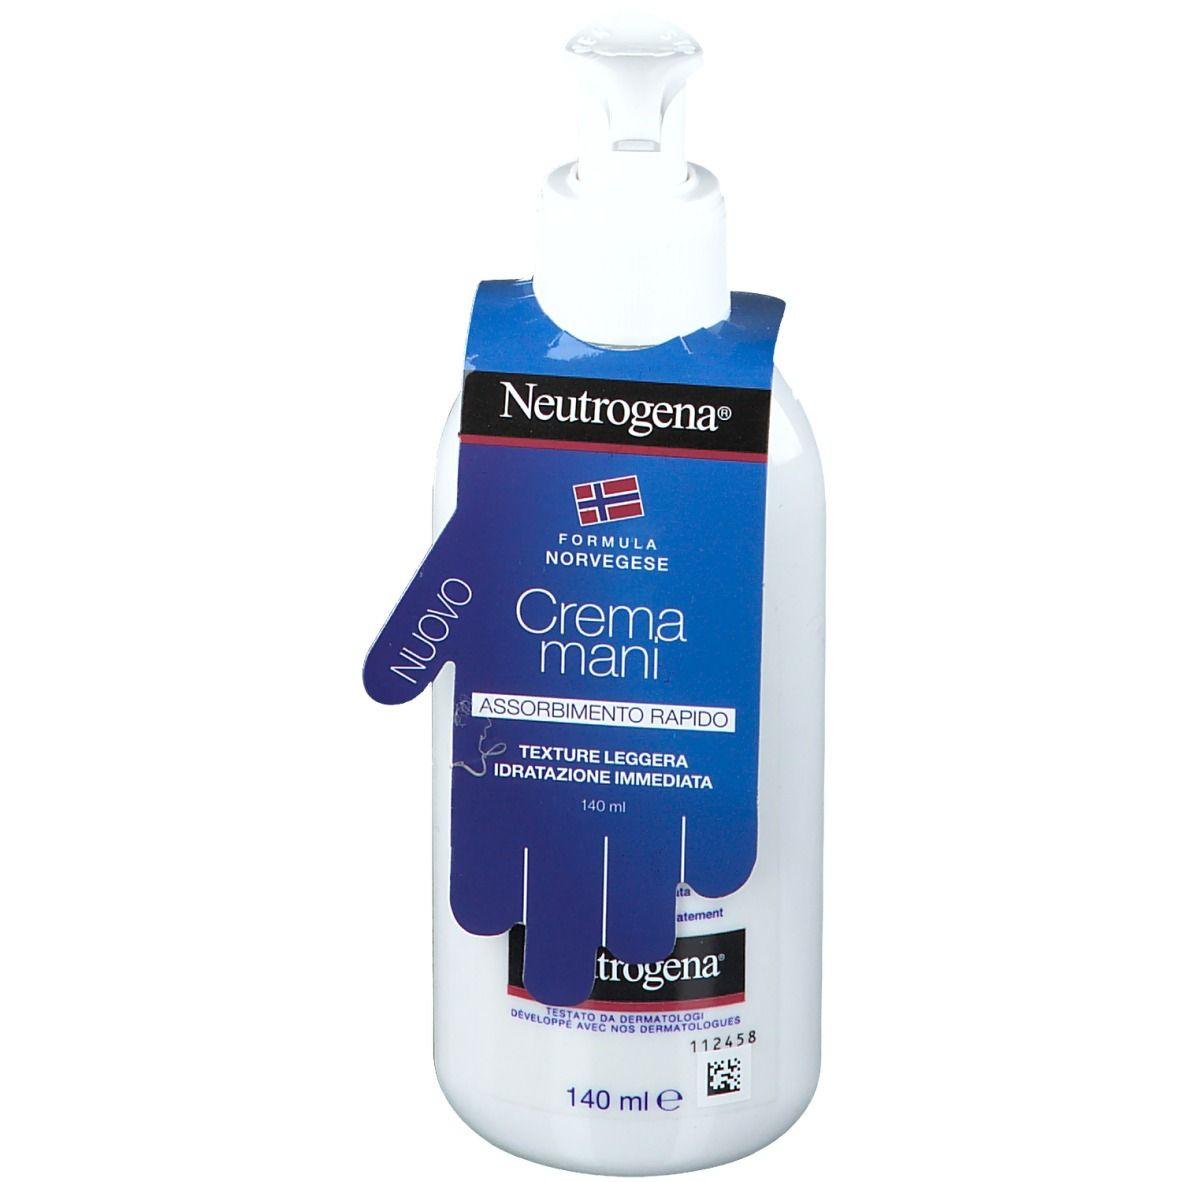 neutrogena ® crema mani assorbimento rapido 140 ml crema